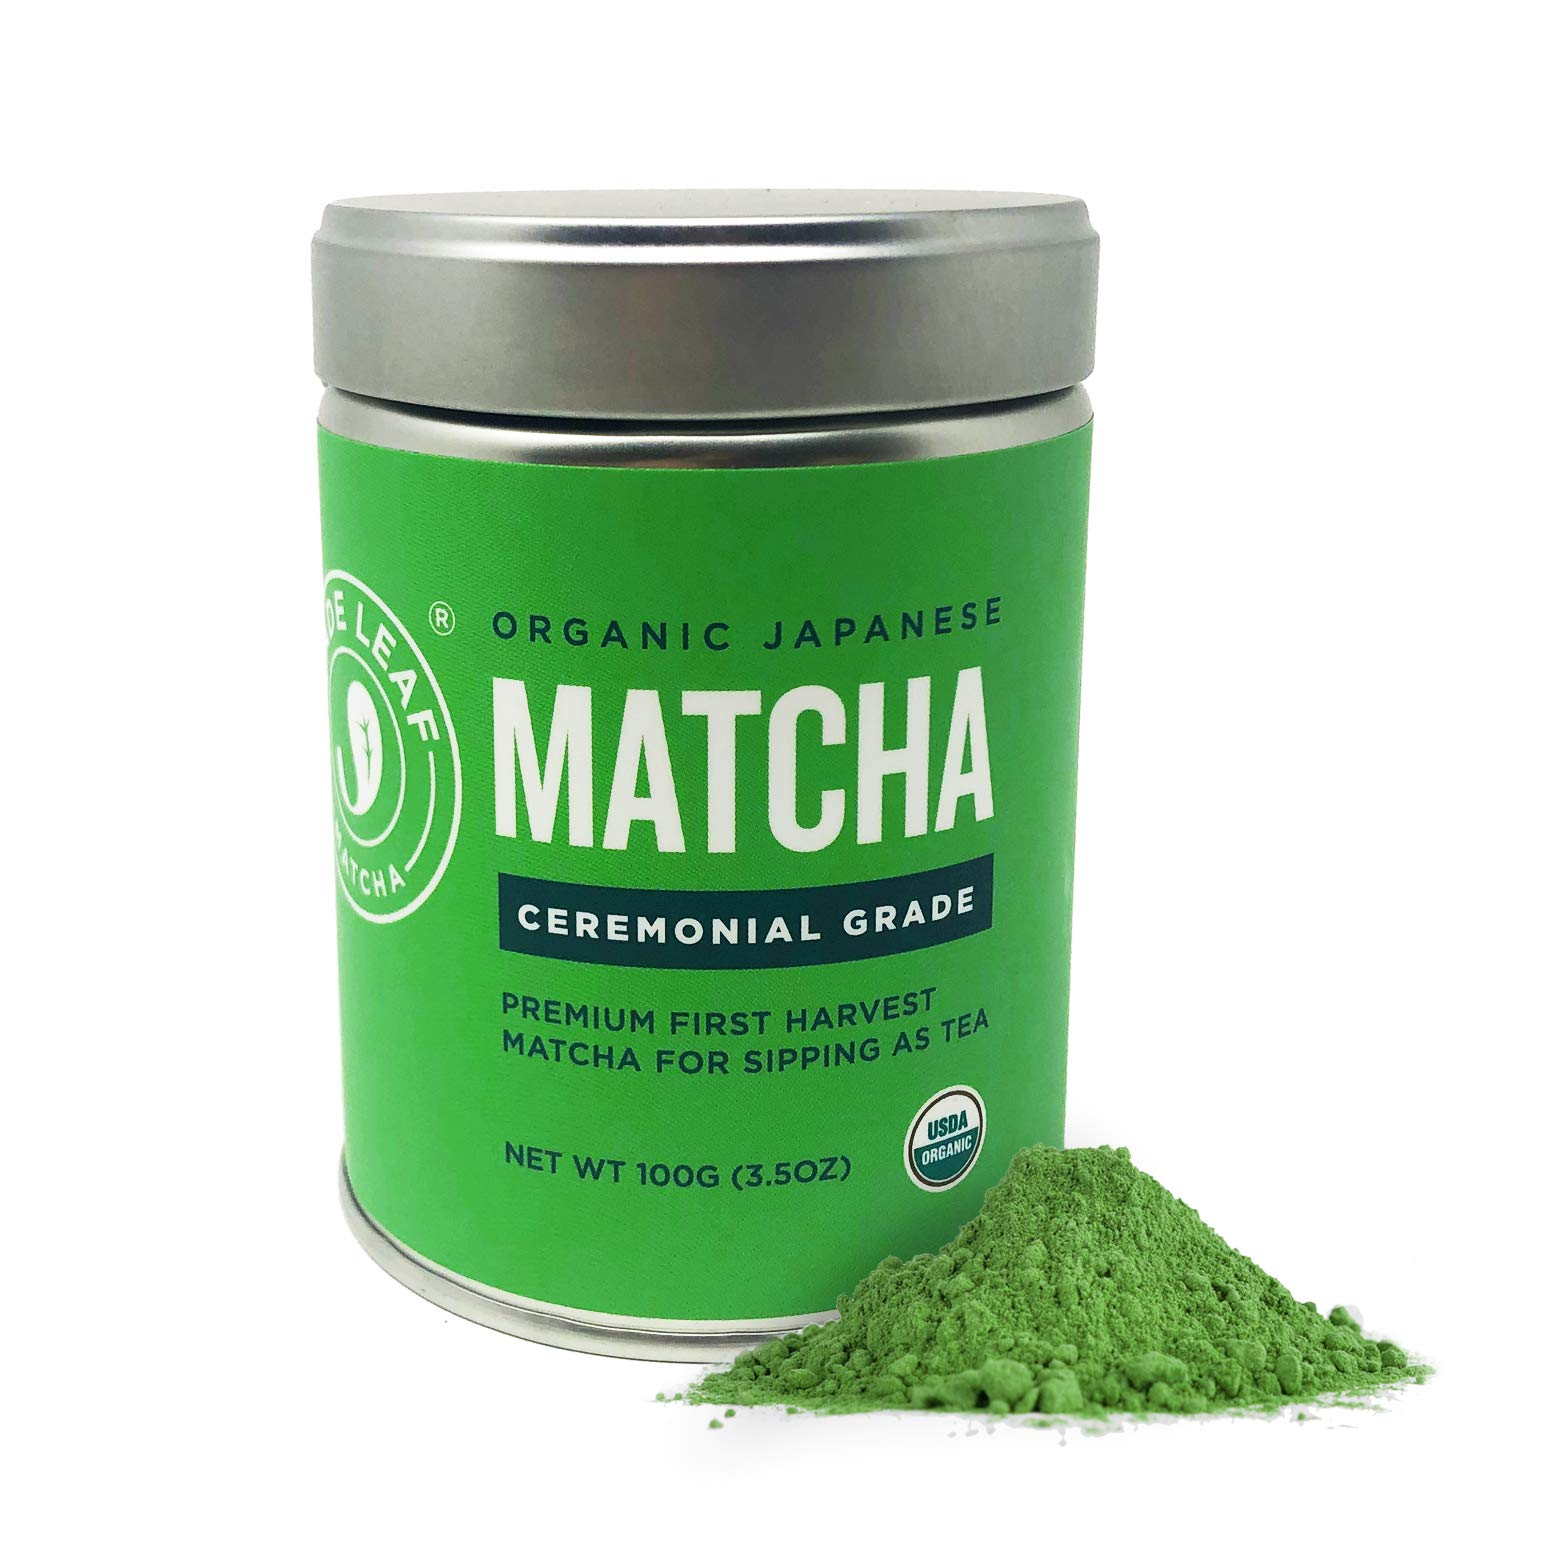 Jade Leaf Organic Ceremonial Grade Matcha Green Tea Powder - Authentic Japanese Origin - Premium 1st Harvest [3.53oz Tin]